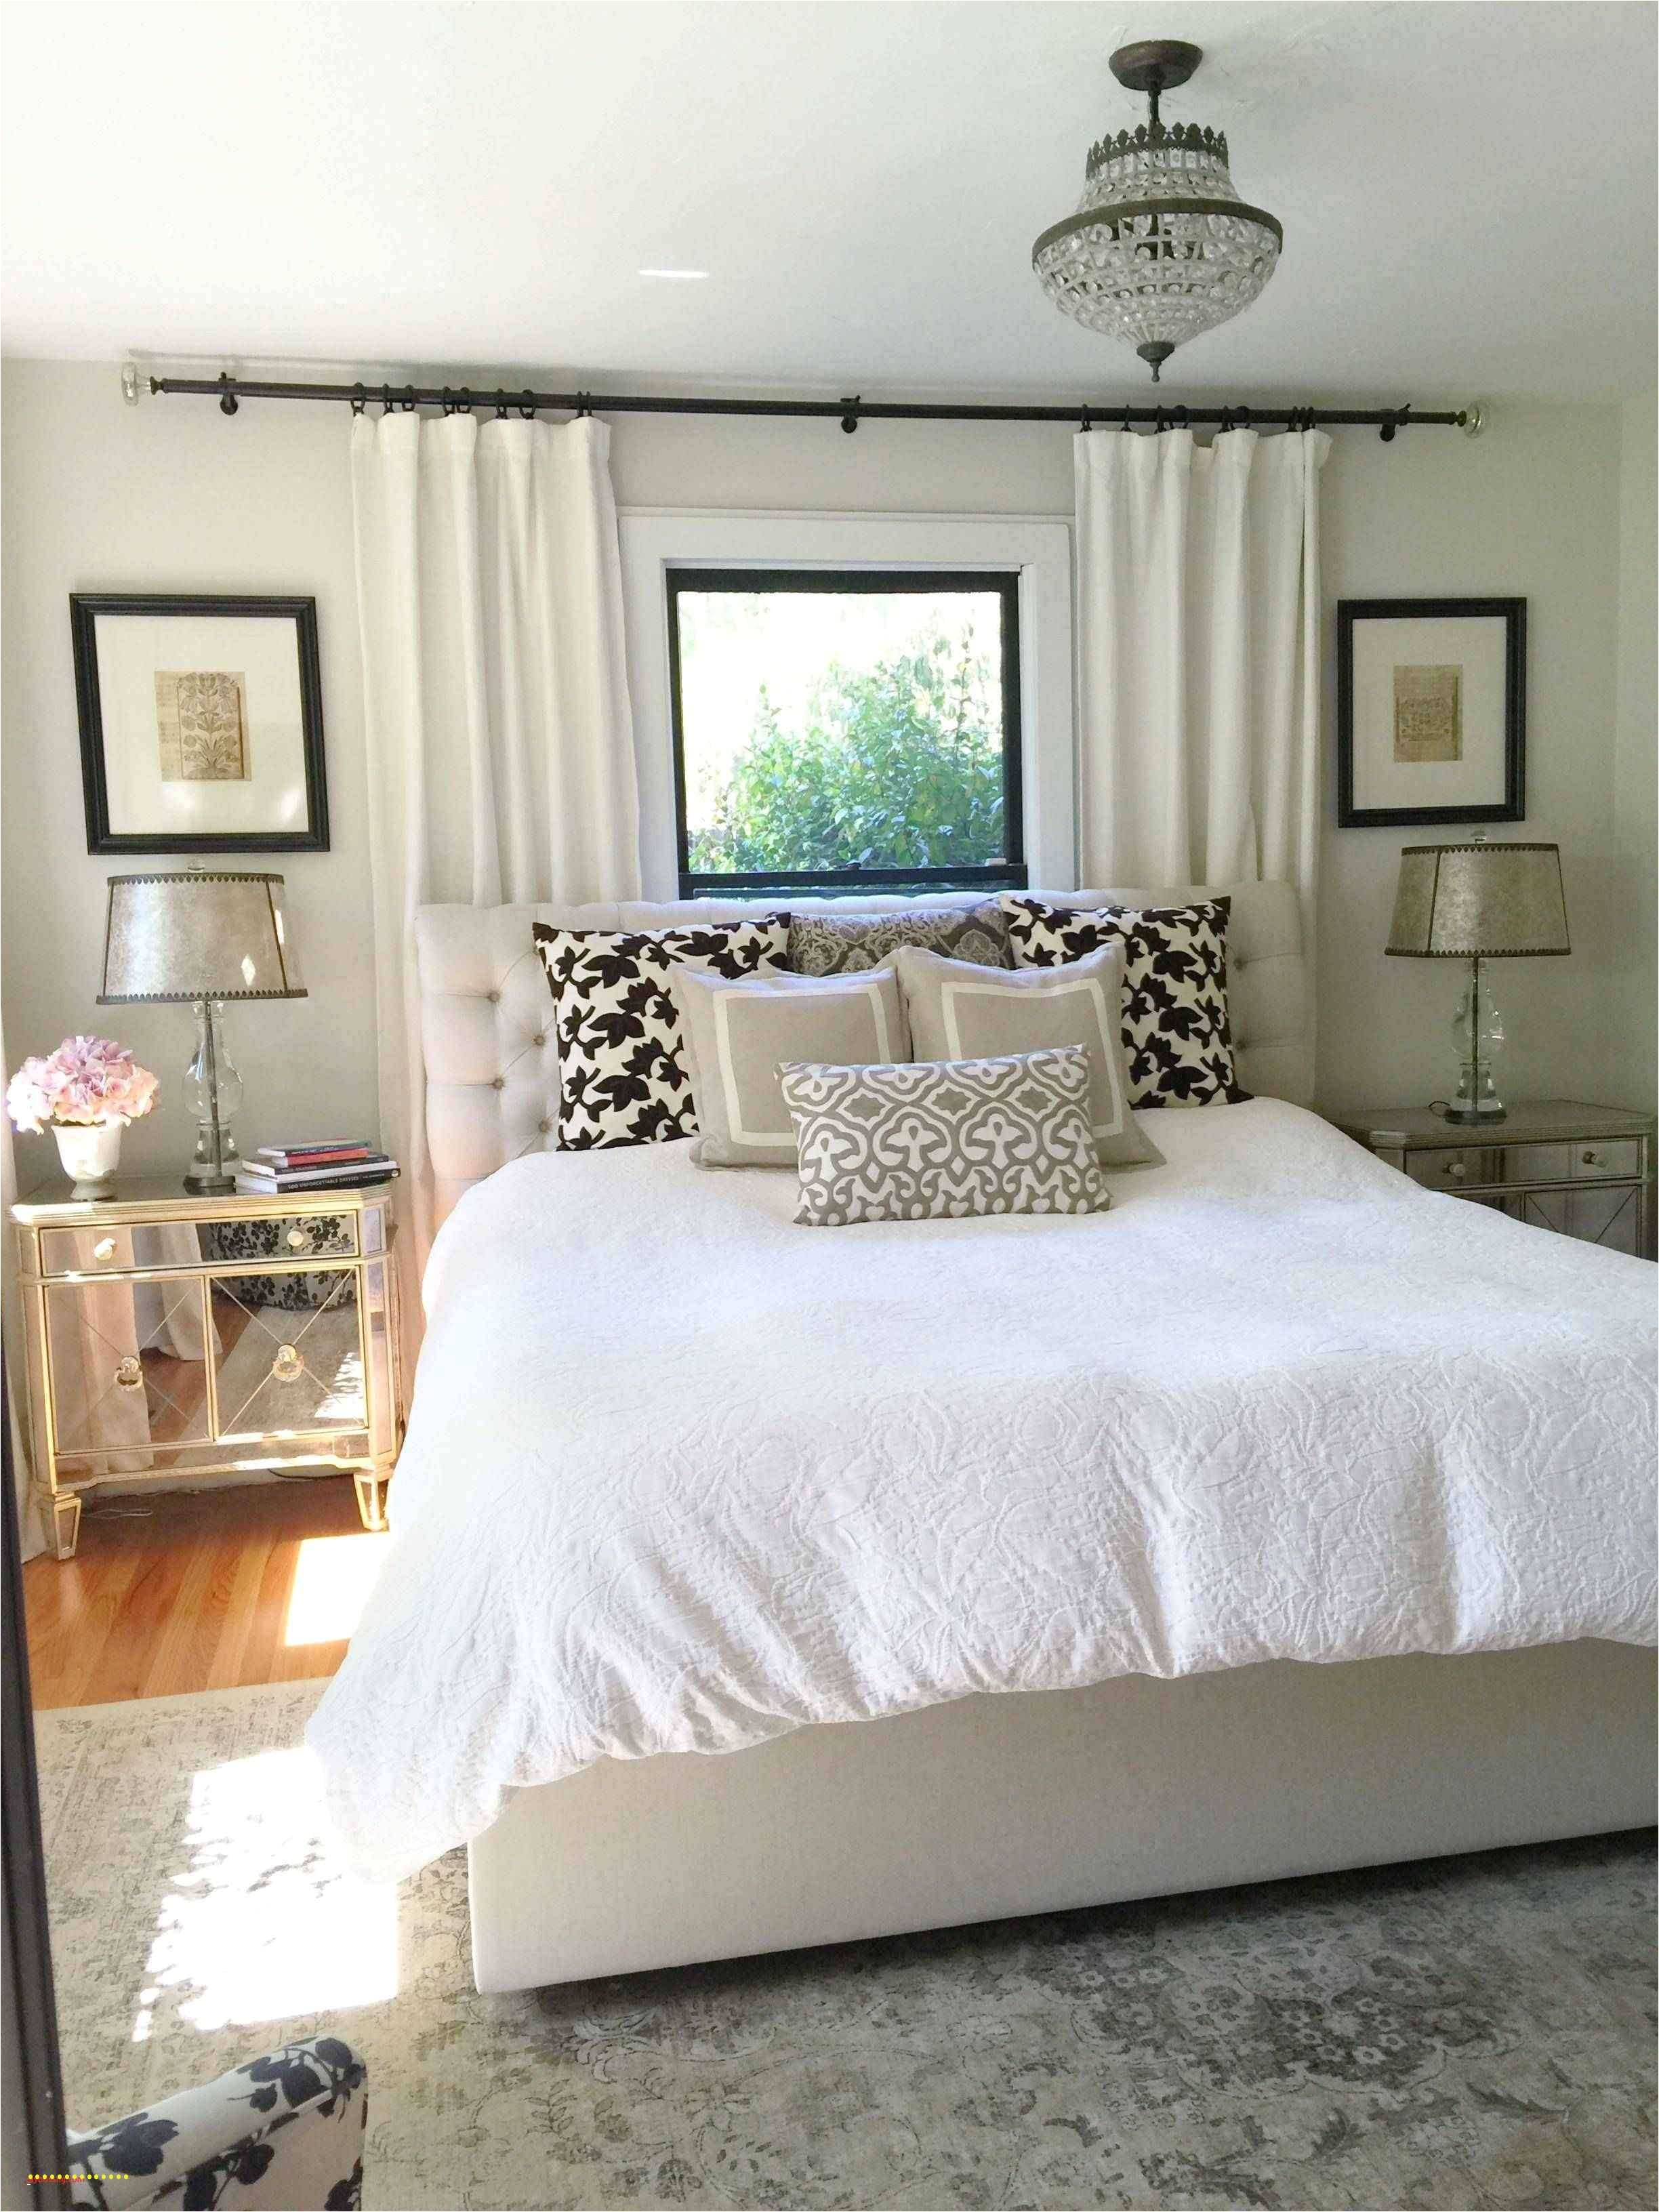 Cool Teenage Bedroom Ideas Unique Cool Bedroom Ideas for Teenagers